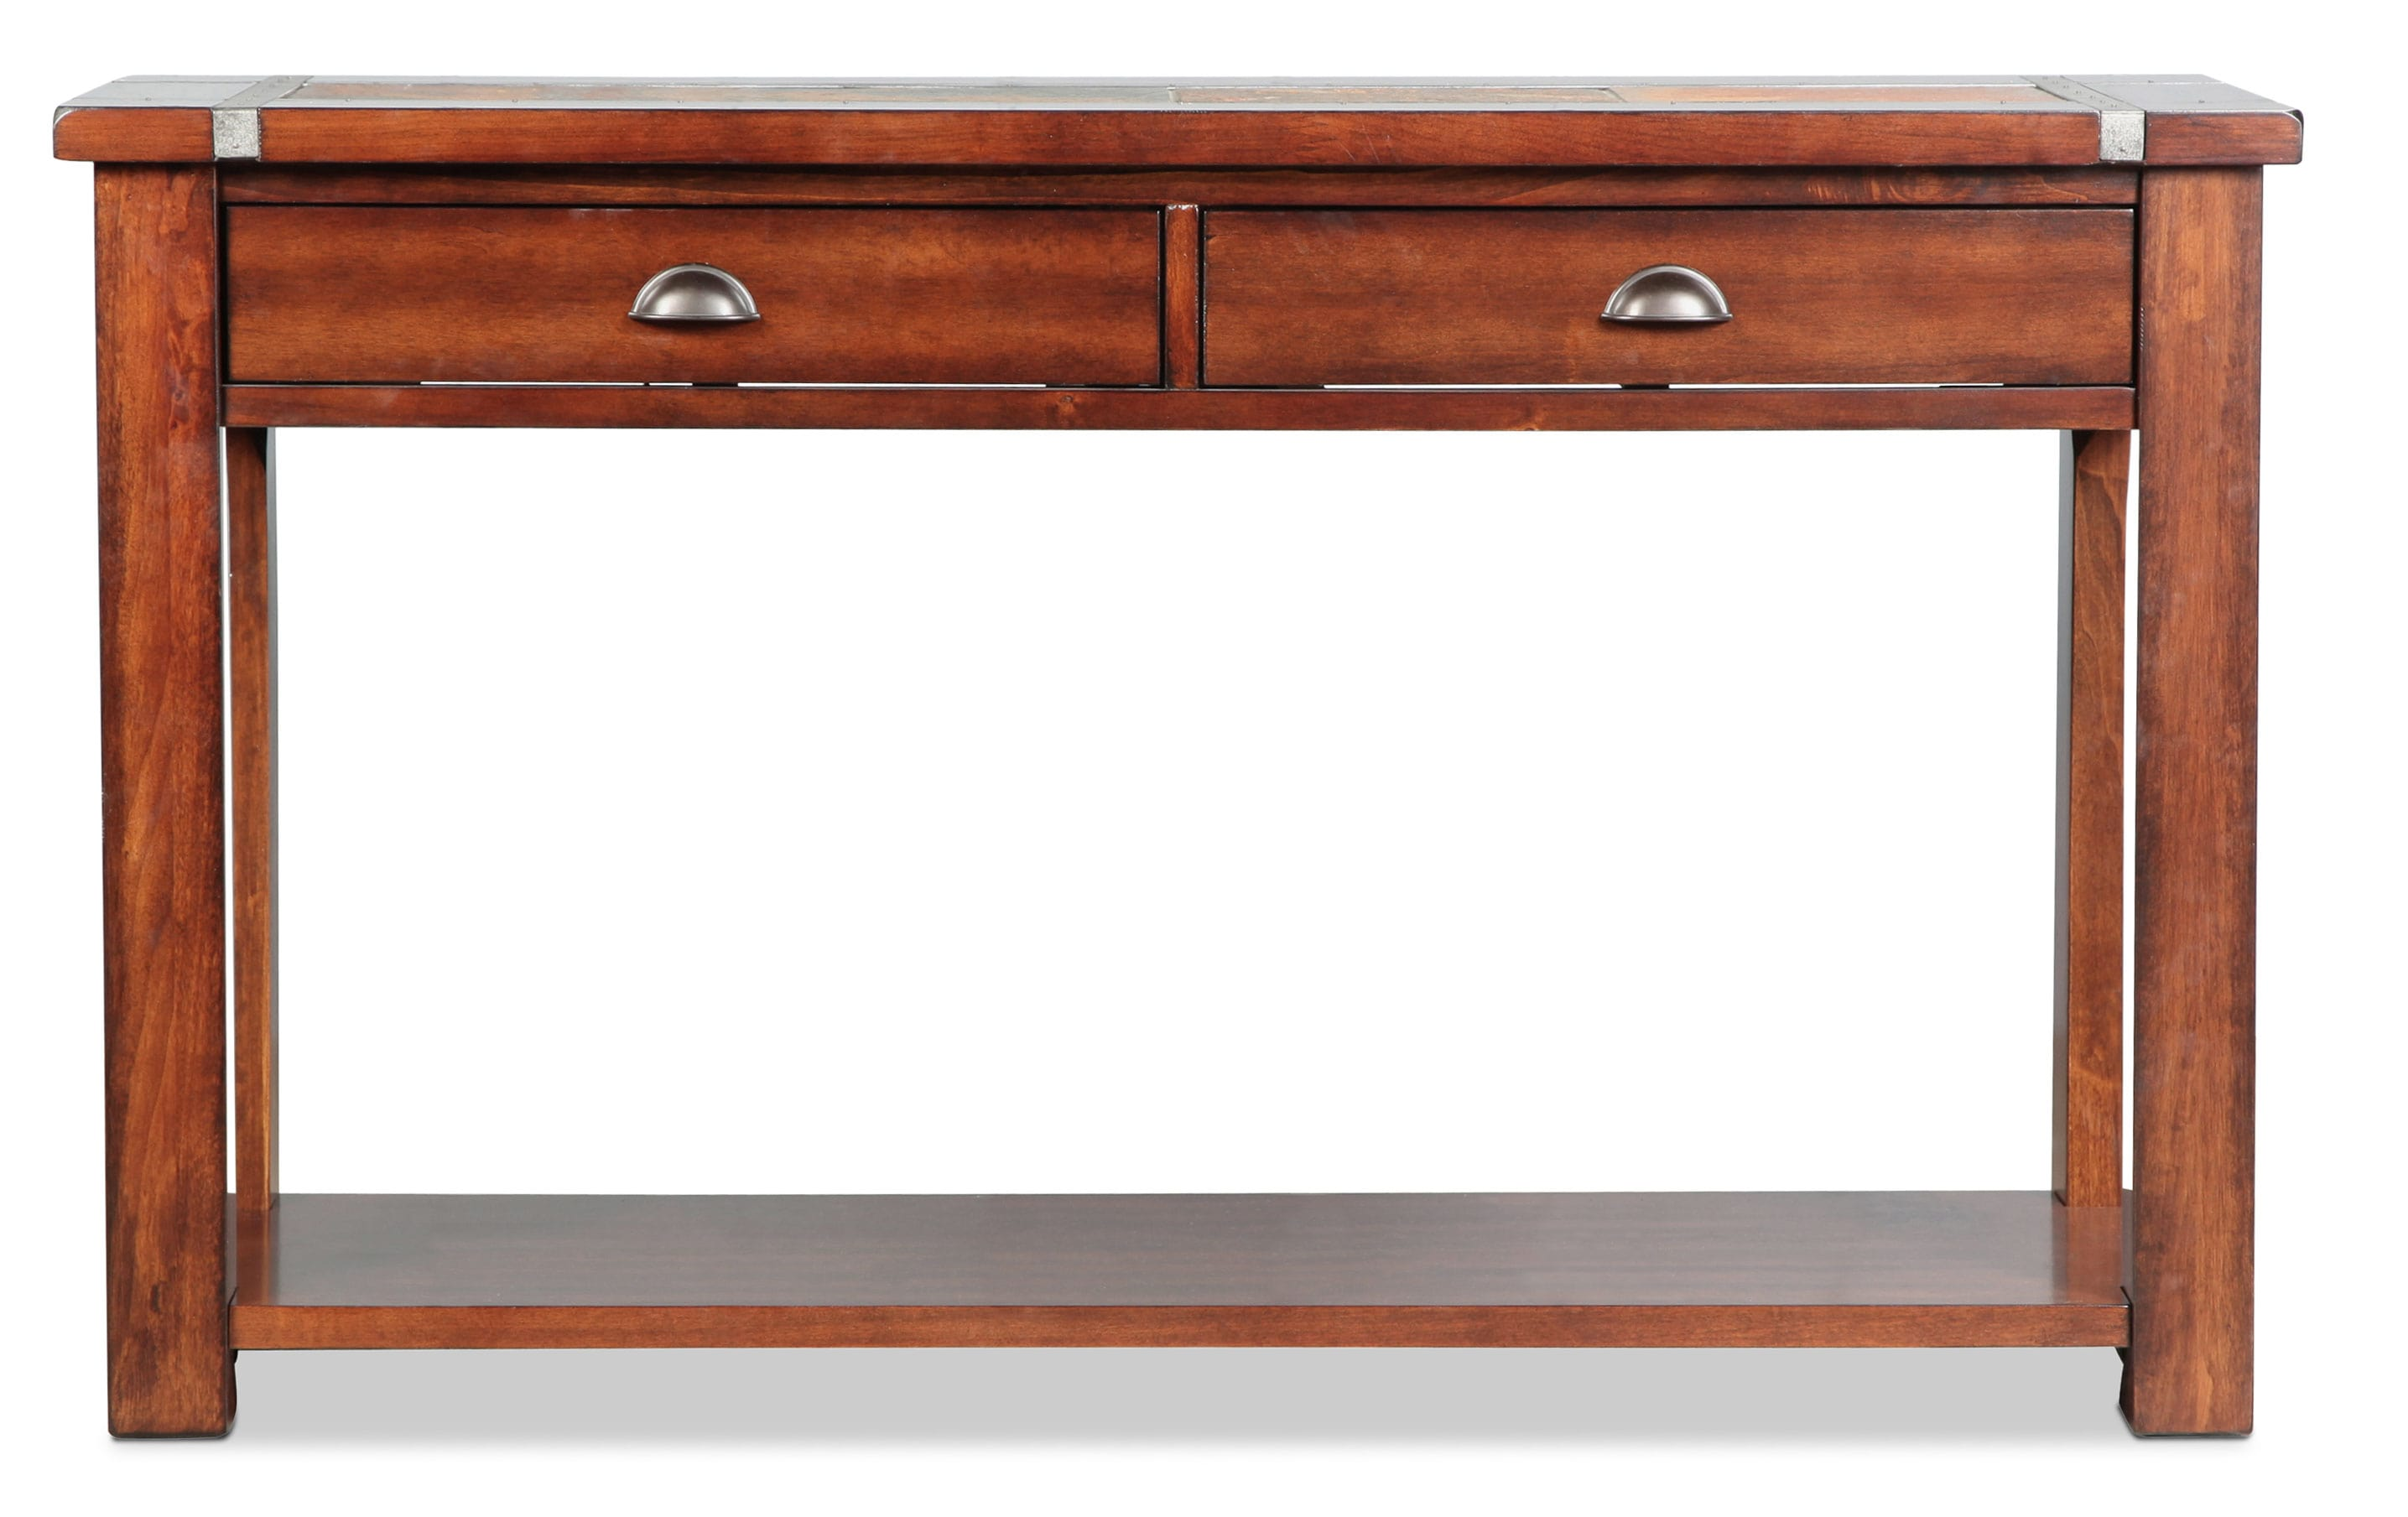 Roanoke Sofa Table - Slate and Cherry